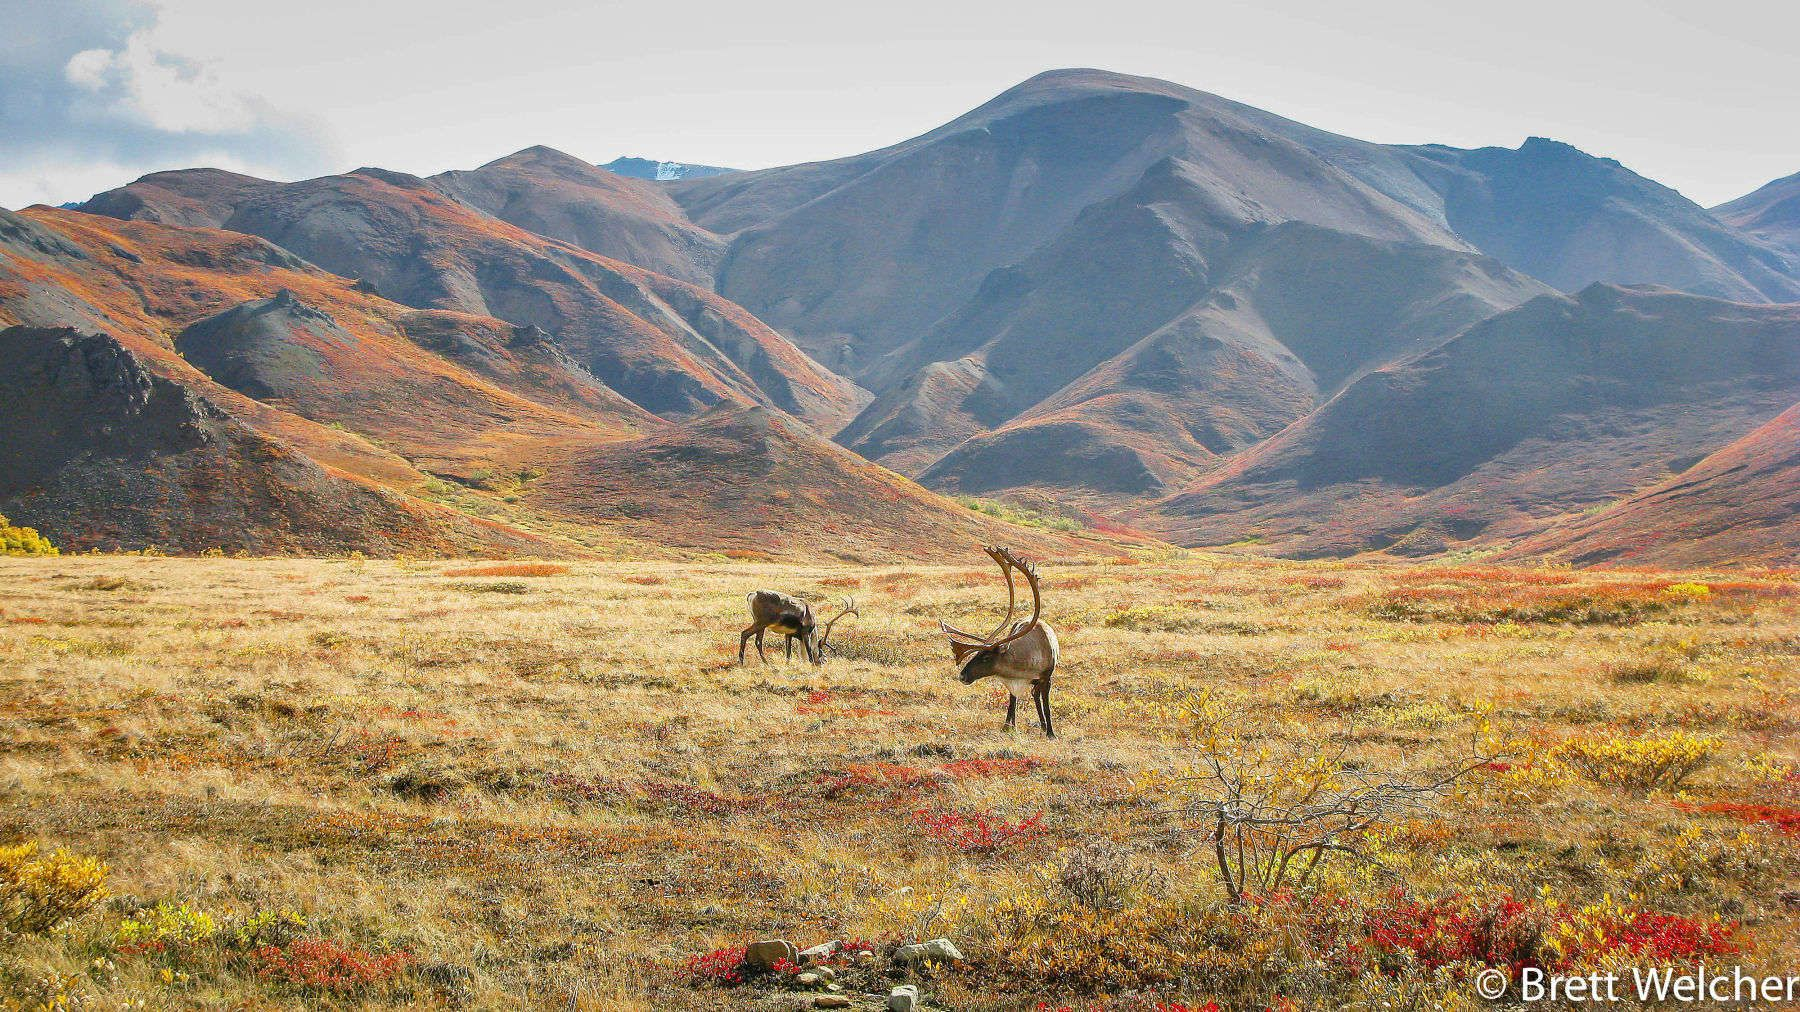 Denali National Park and Preserve - Denali Park, Alaska